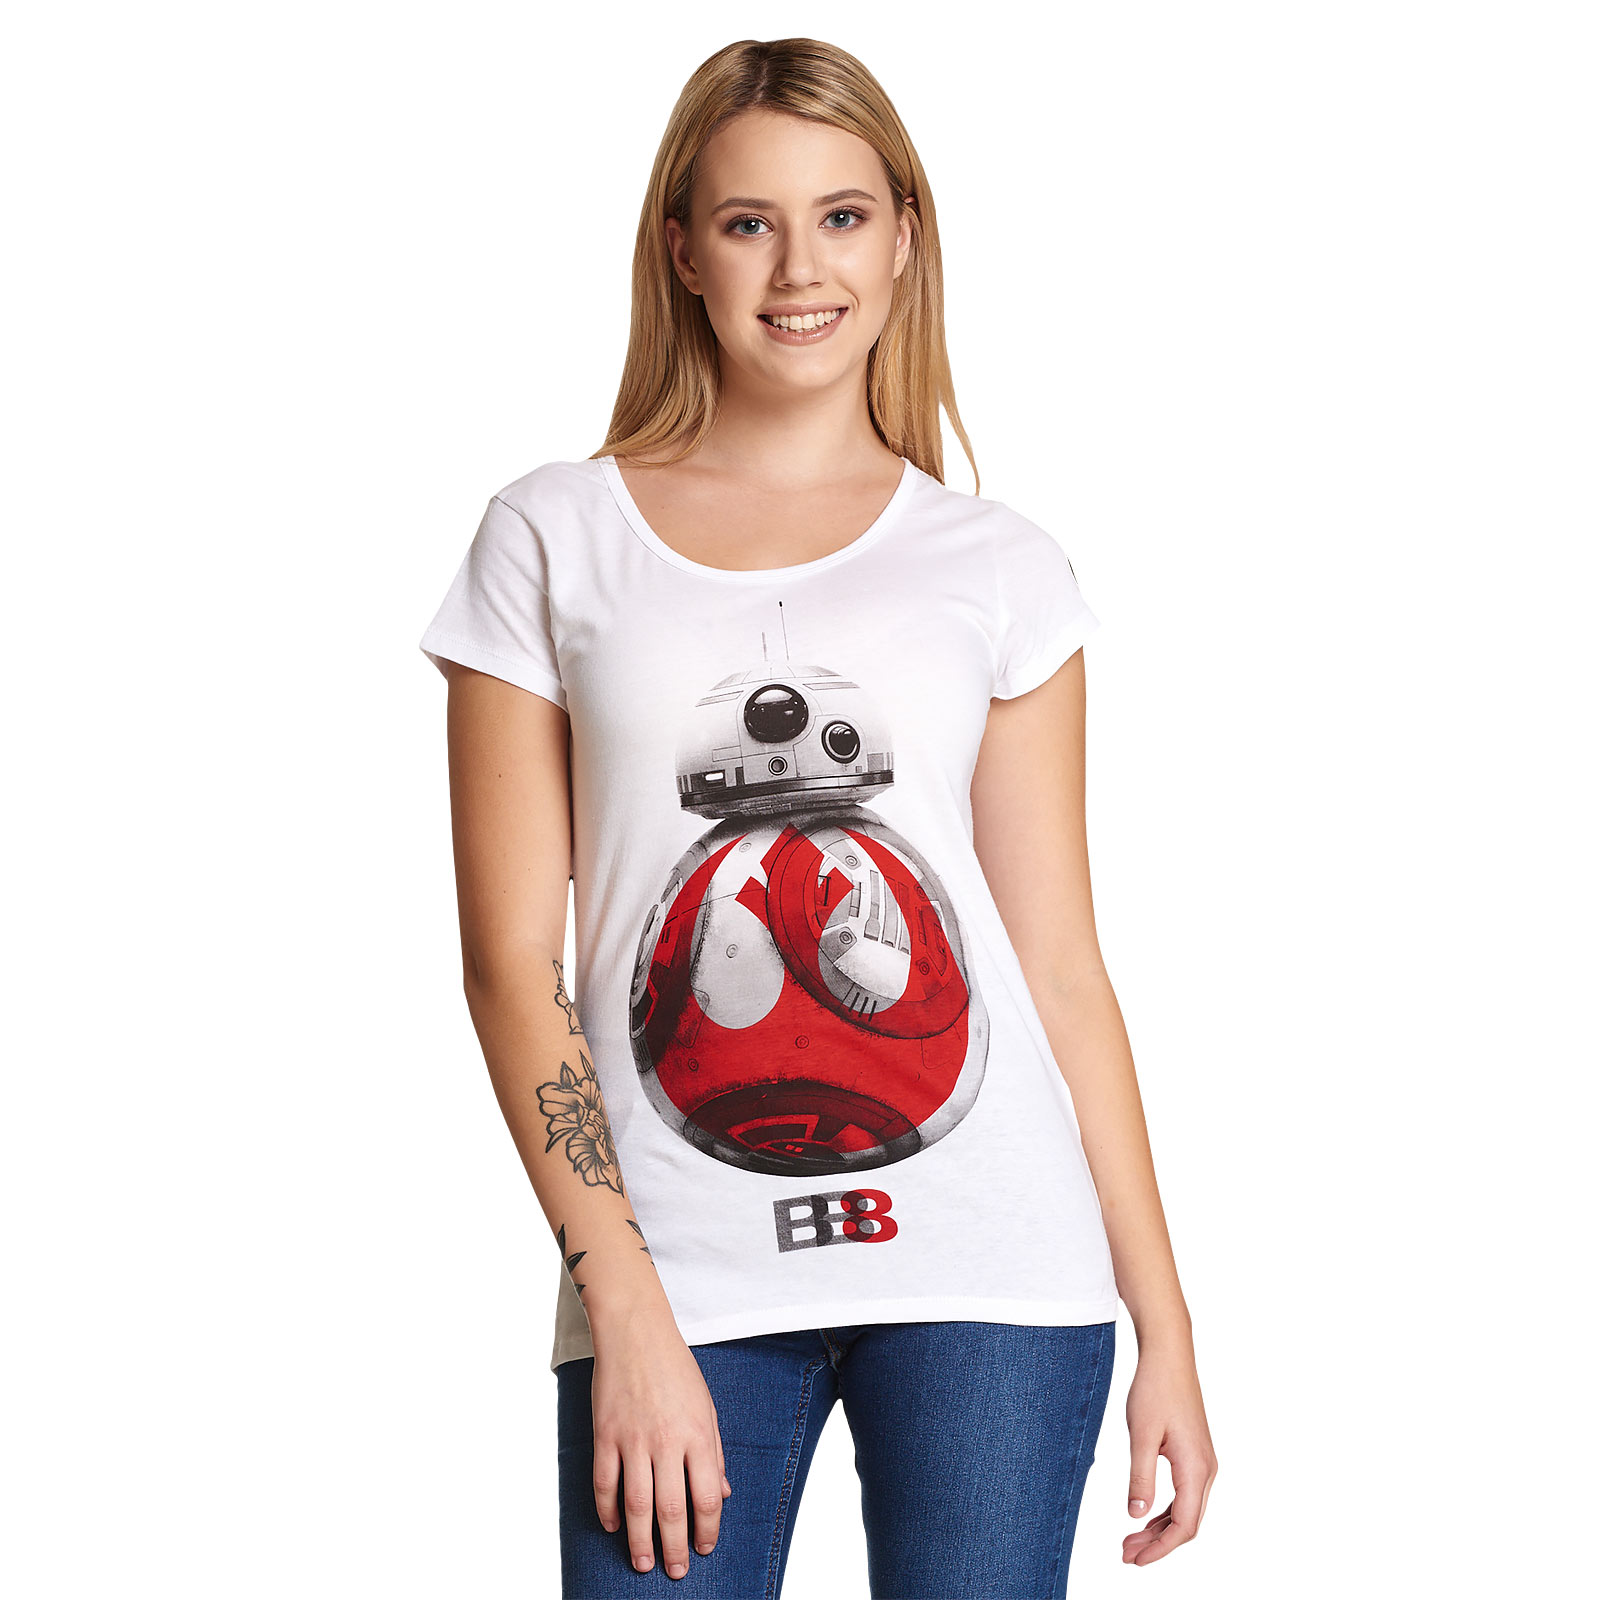 Star Wars - Rebel BB-8 T-Shirt Damen weiß